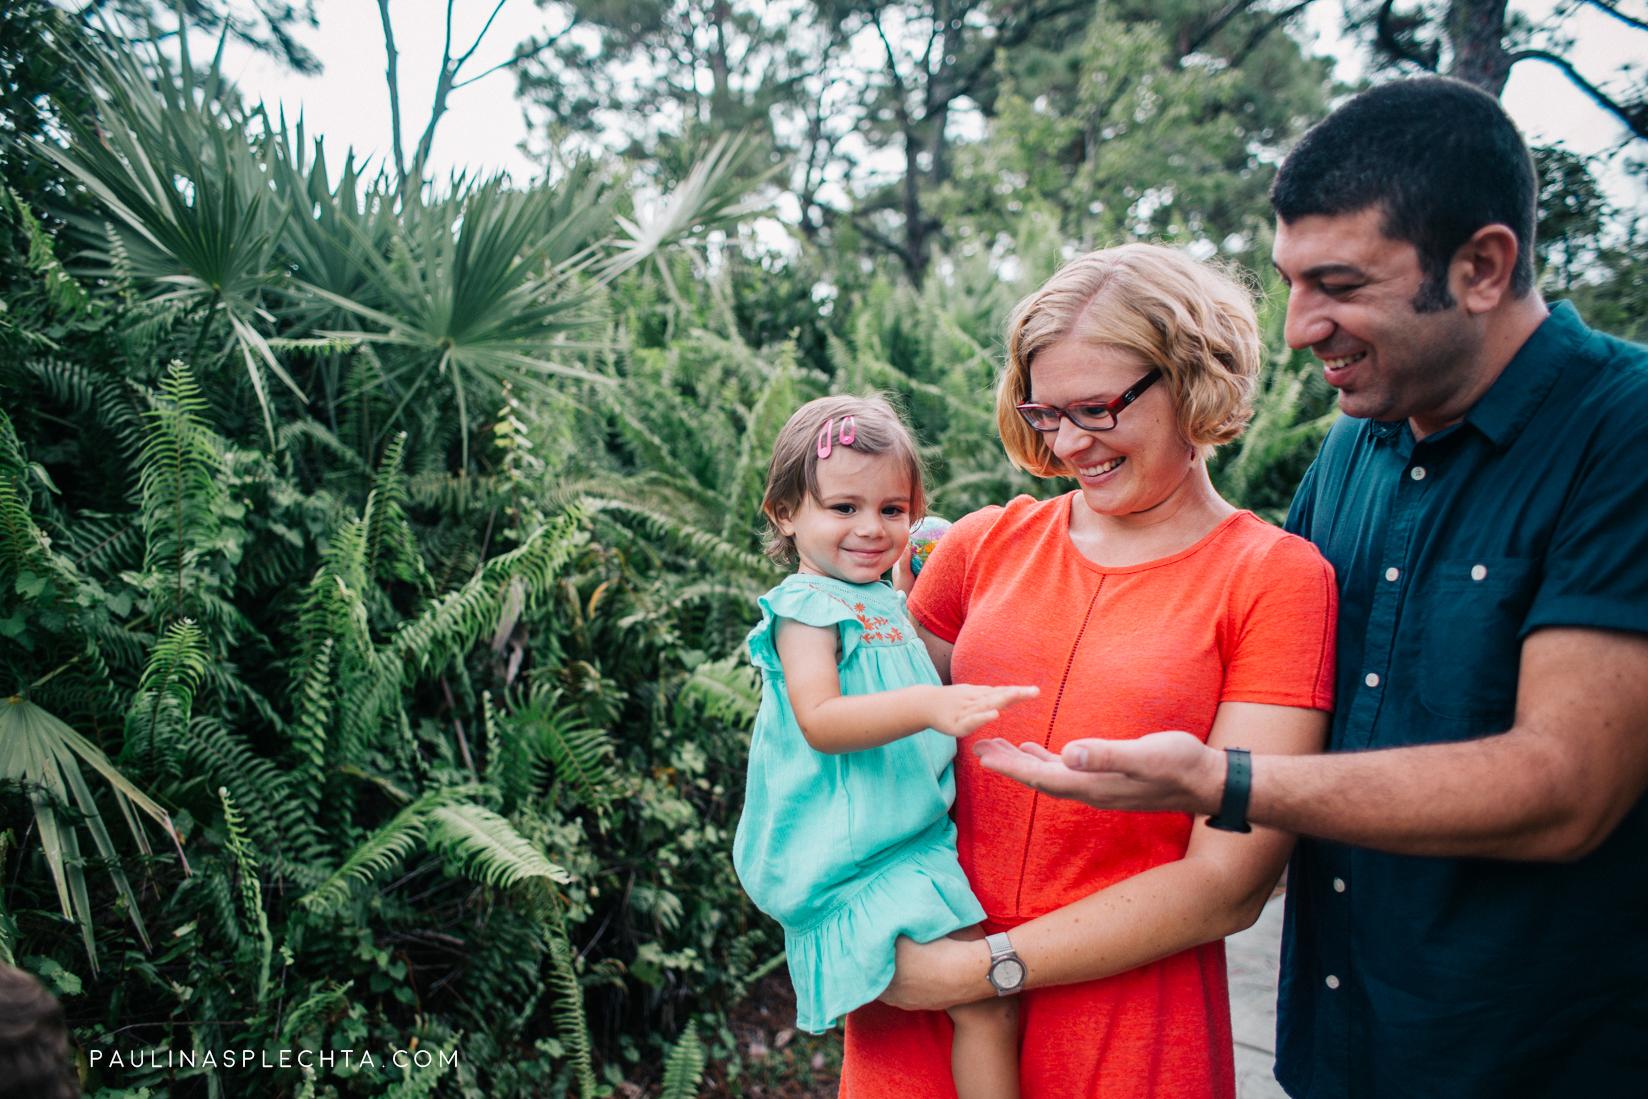 candid-photography-lifestyle-family-photographer-boca-raton-delray-beach-coral-springs-broward-palm-beach.jpg